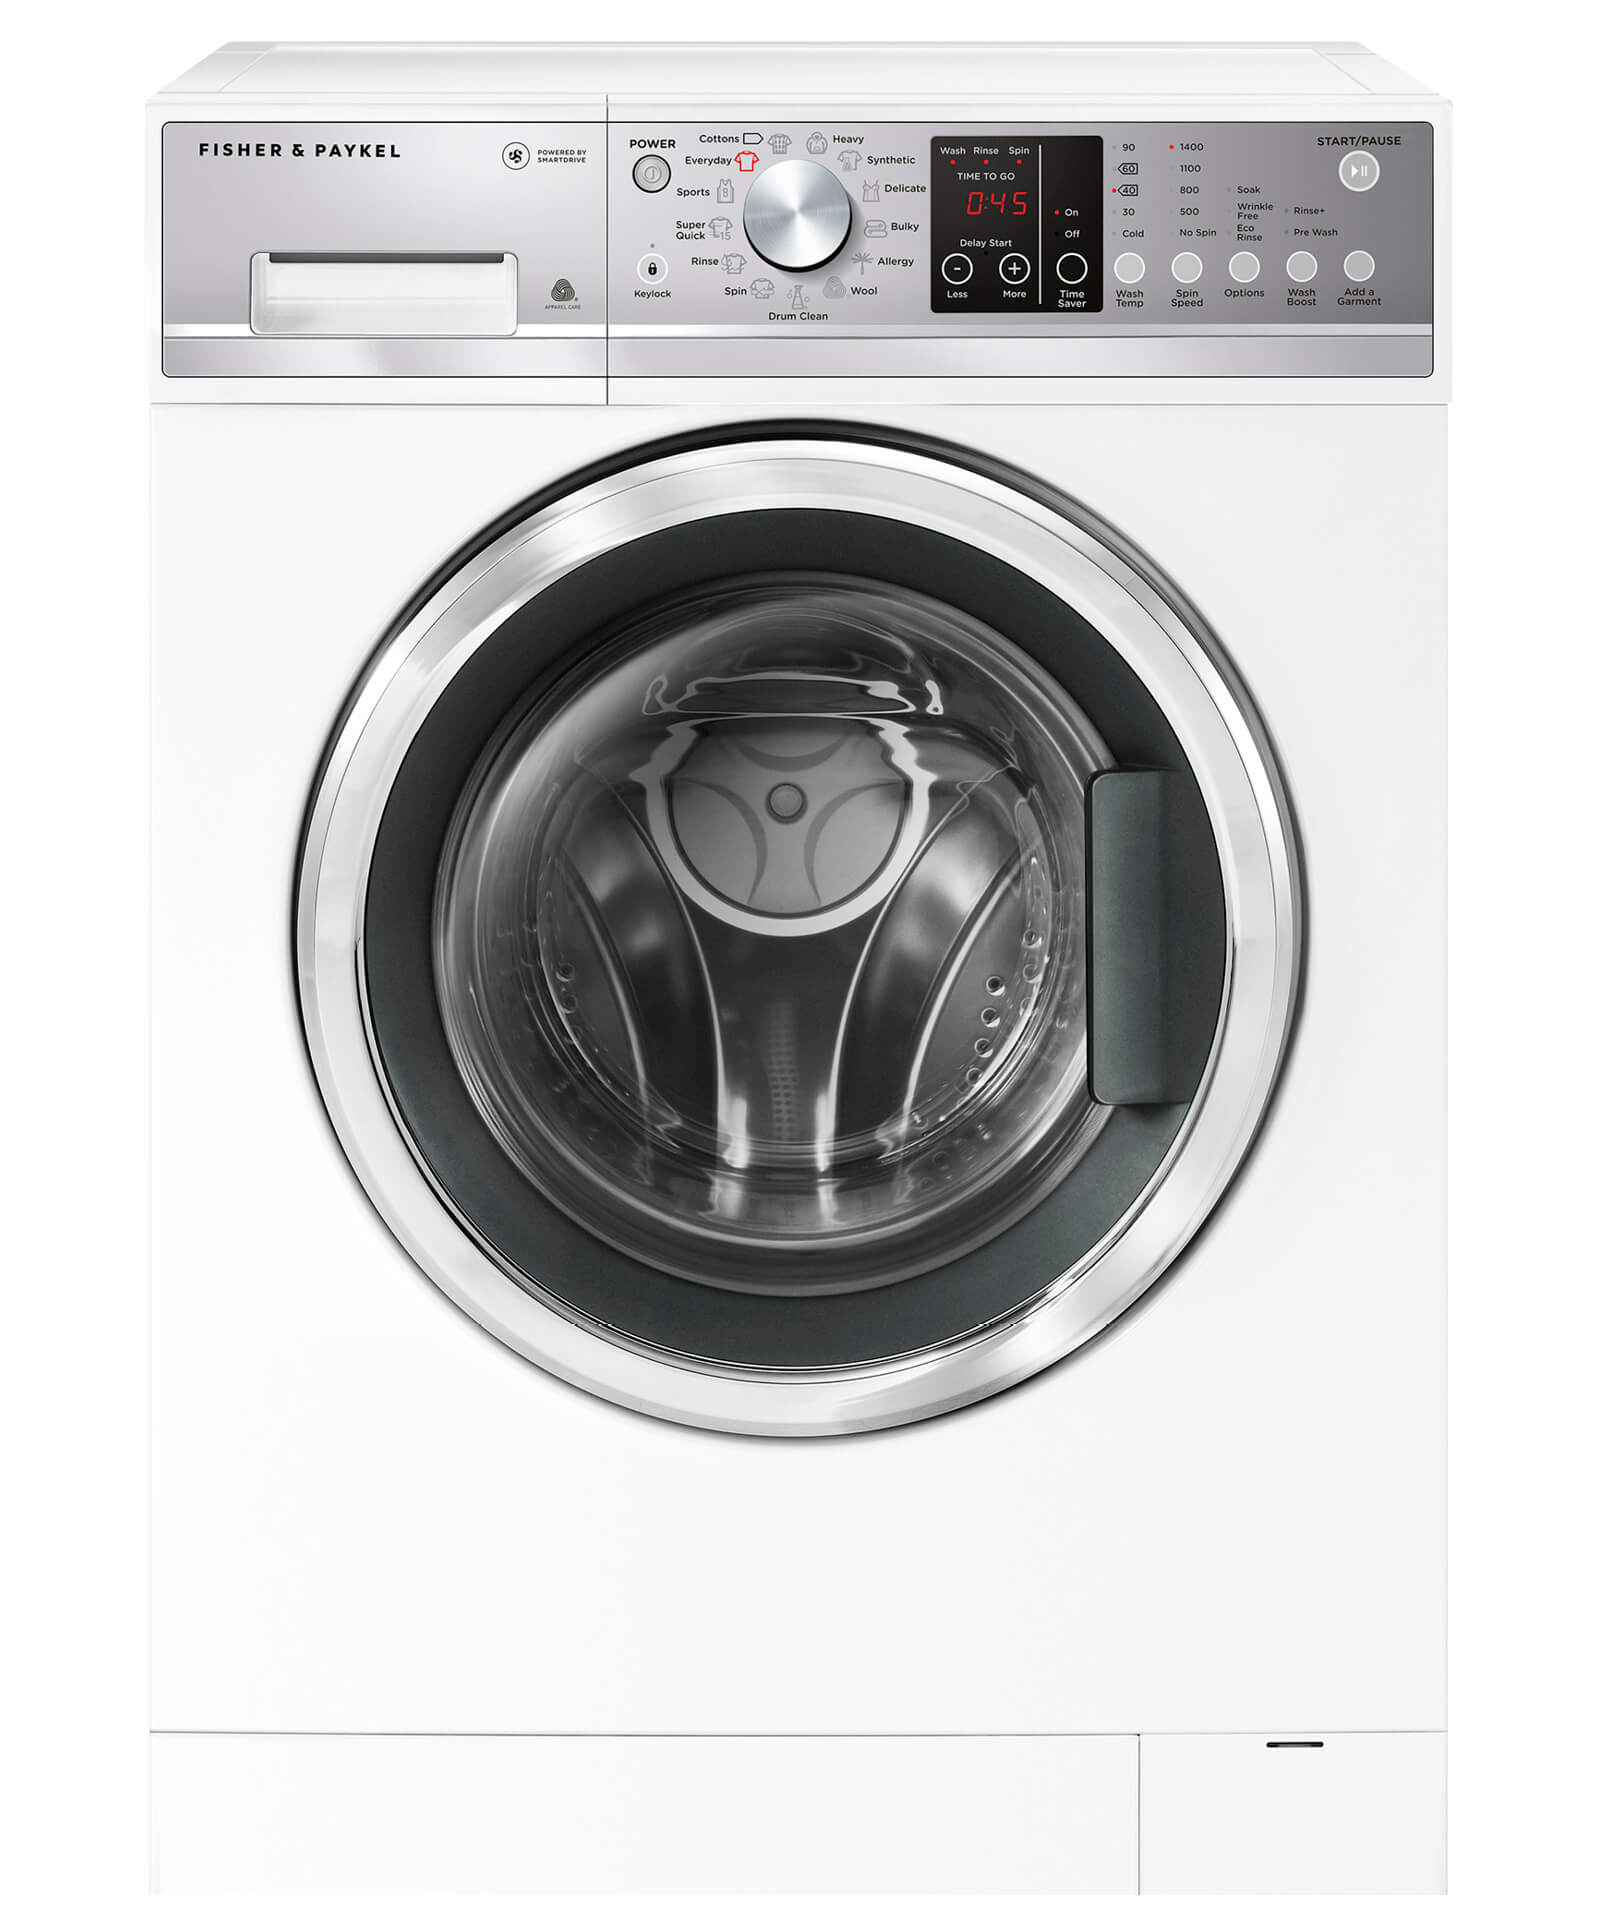 fisher paykel washing machine 5.5 kg user guide